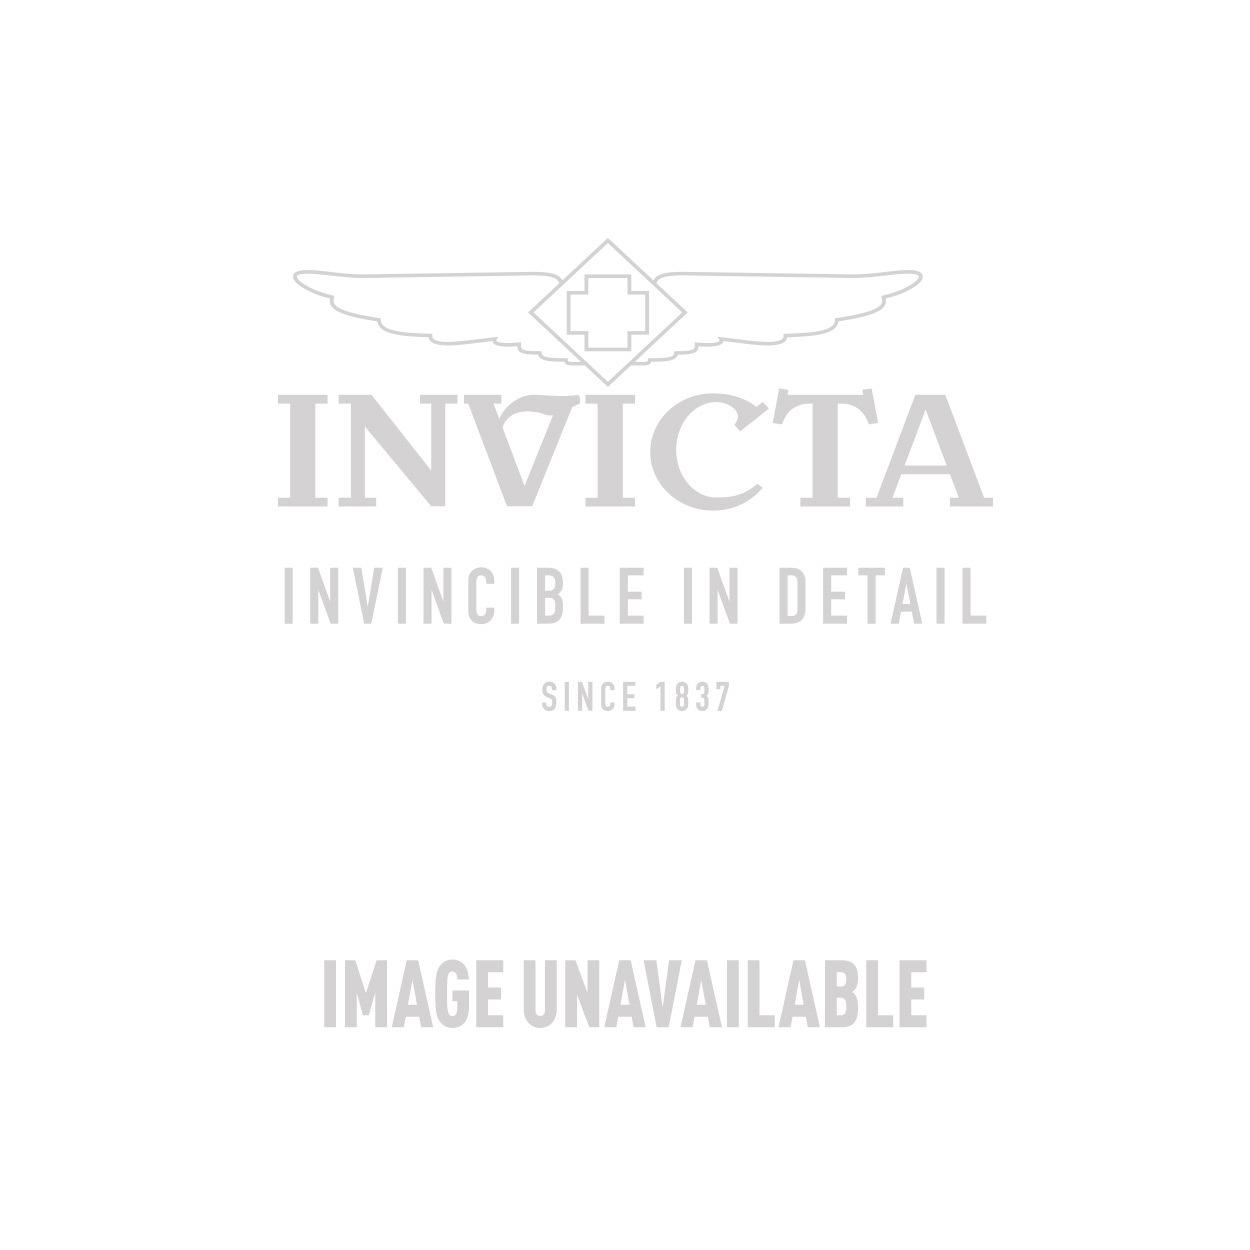 Invicta Corduba Swiss Made Quartz Watch - Black case with Blue tone Polyurethane band - Model 90233